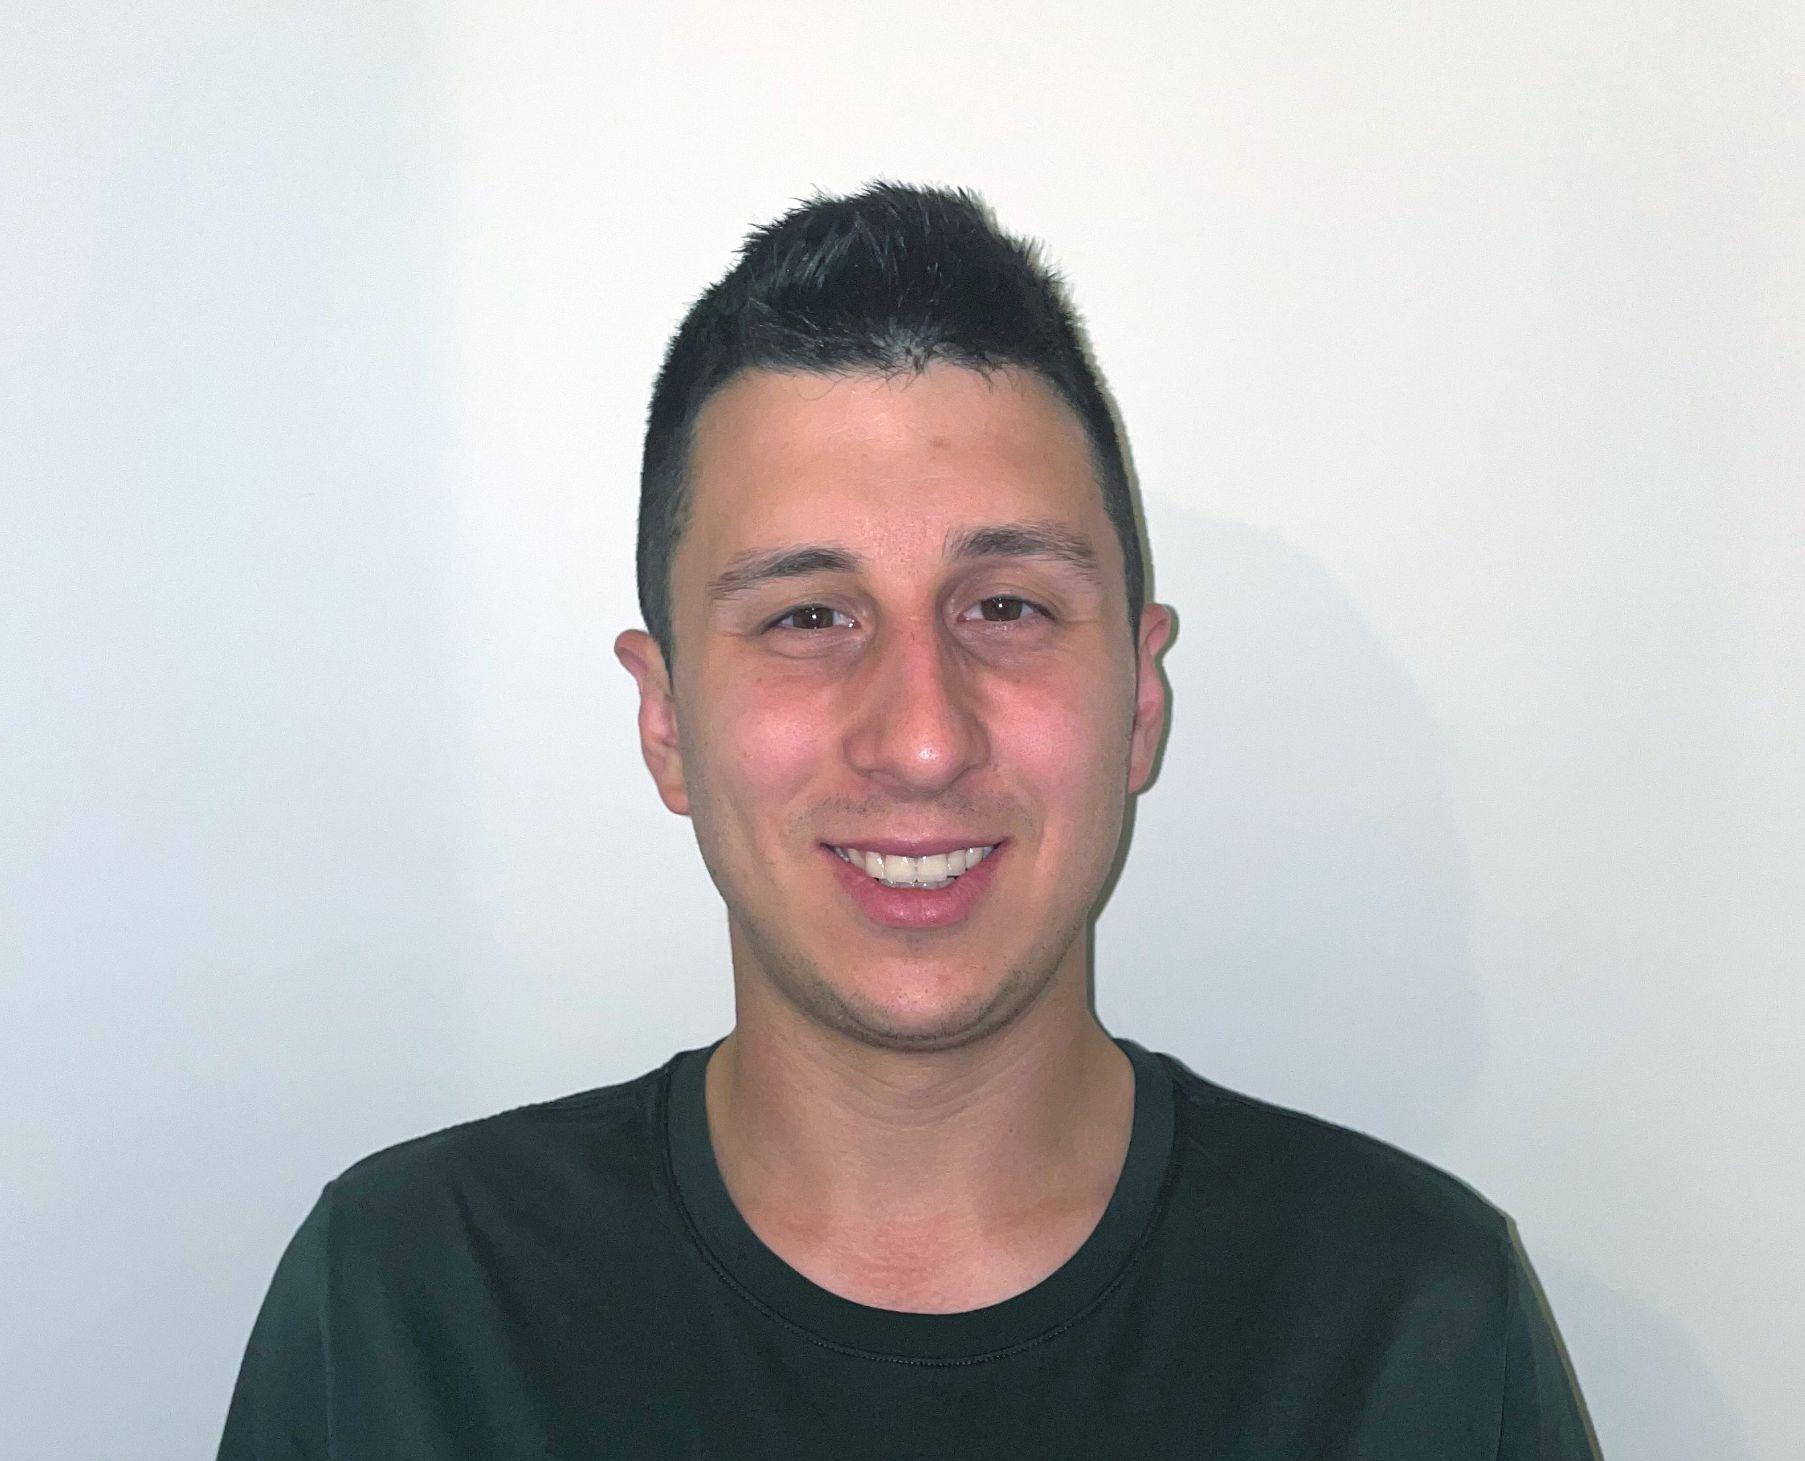 Marcus Grillo